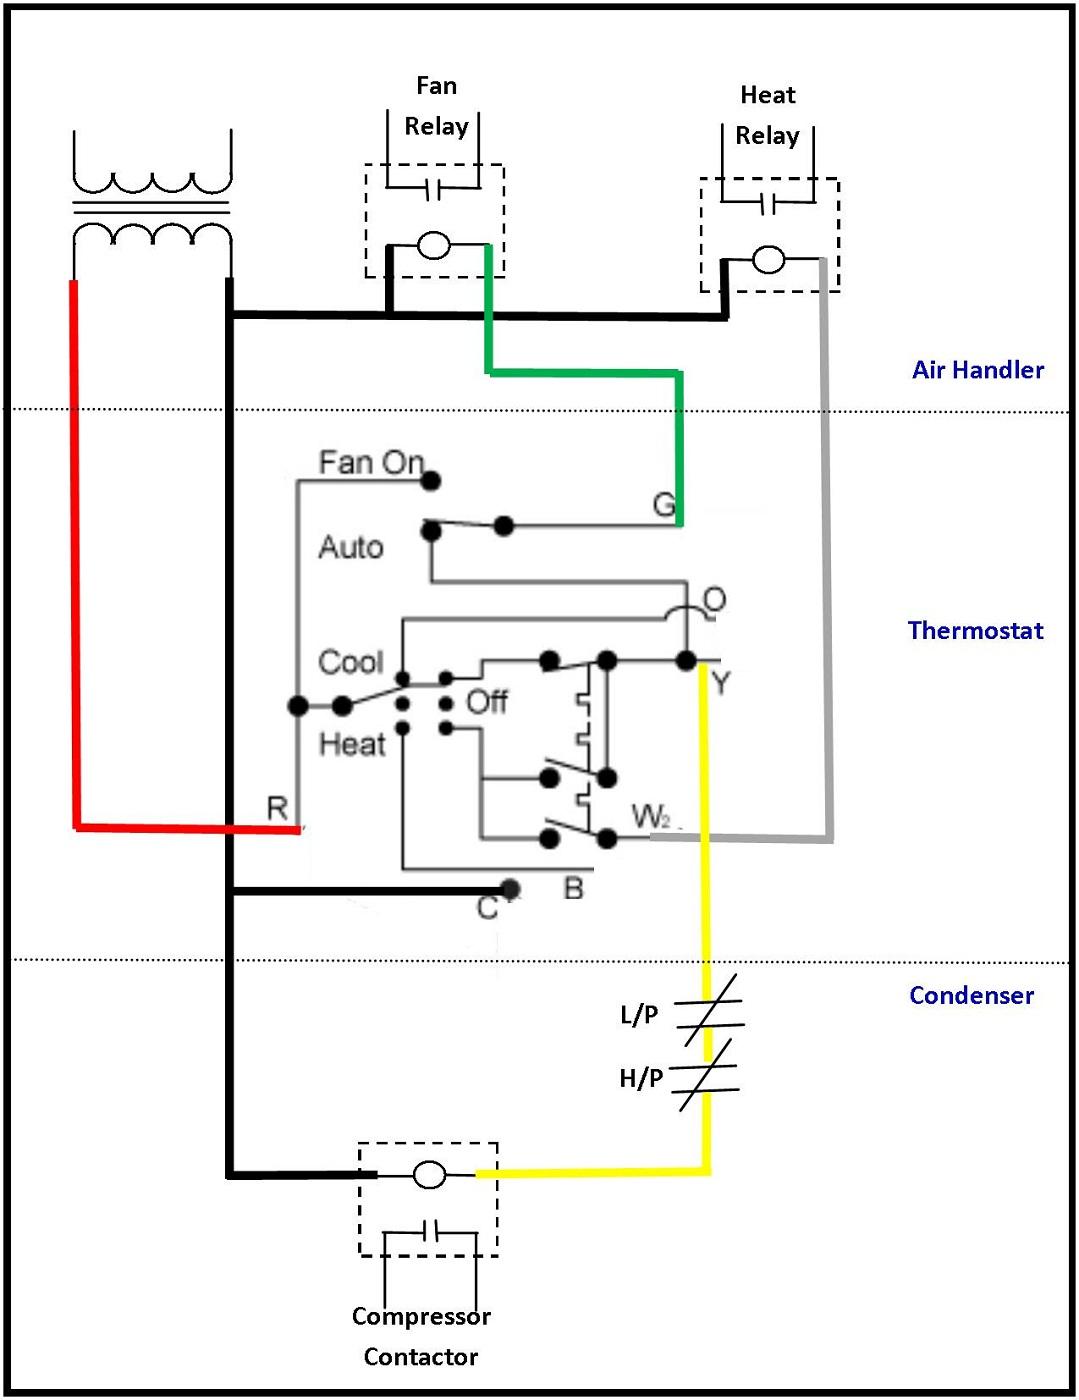 Hvac Wiring Diagrams 101 -99 Ford F150 Fuse Diagram | Begeboy Wiring Diagram  Source | Hvac Wiring Diagrams 101 |  | Begeboy Wiring Diagram Source